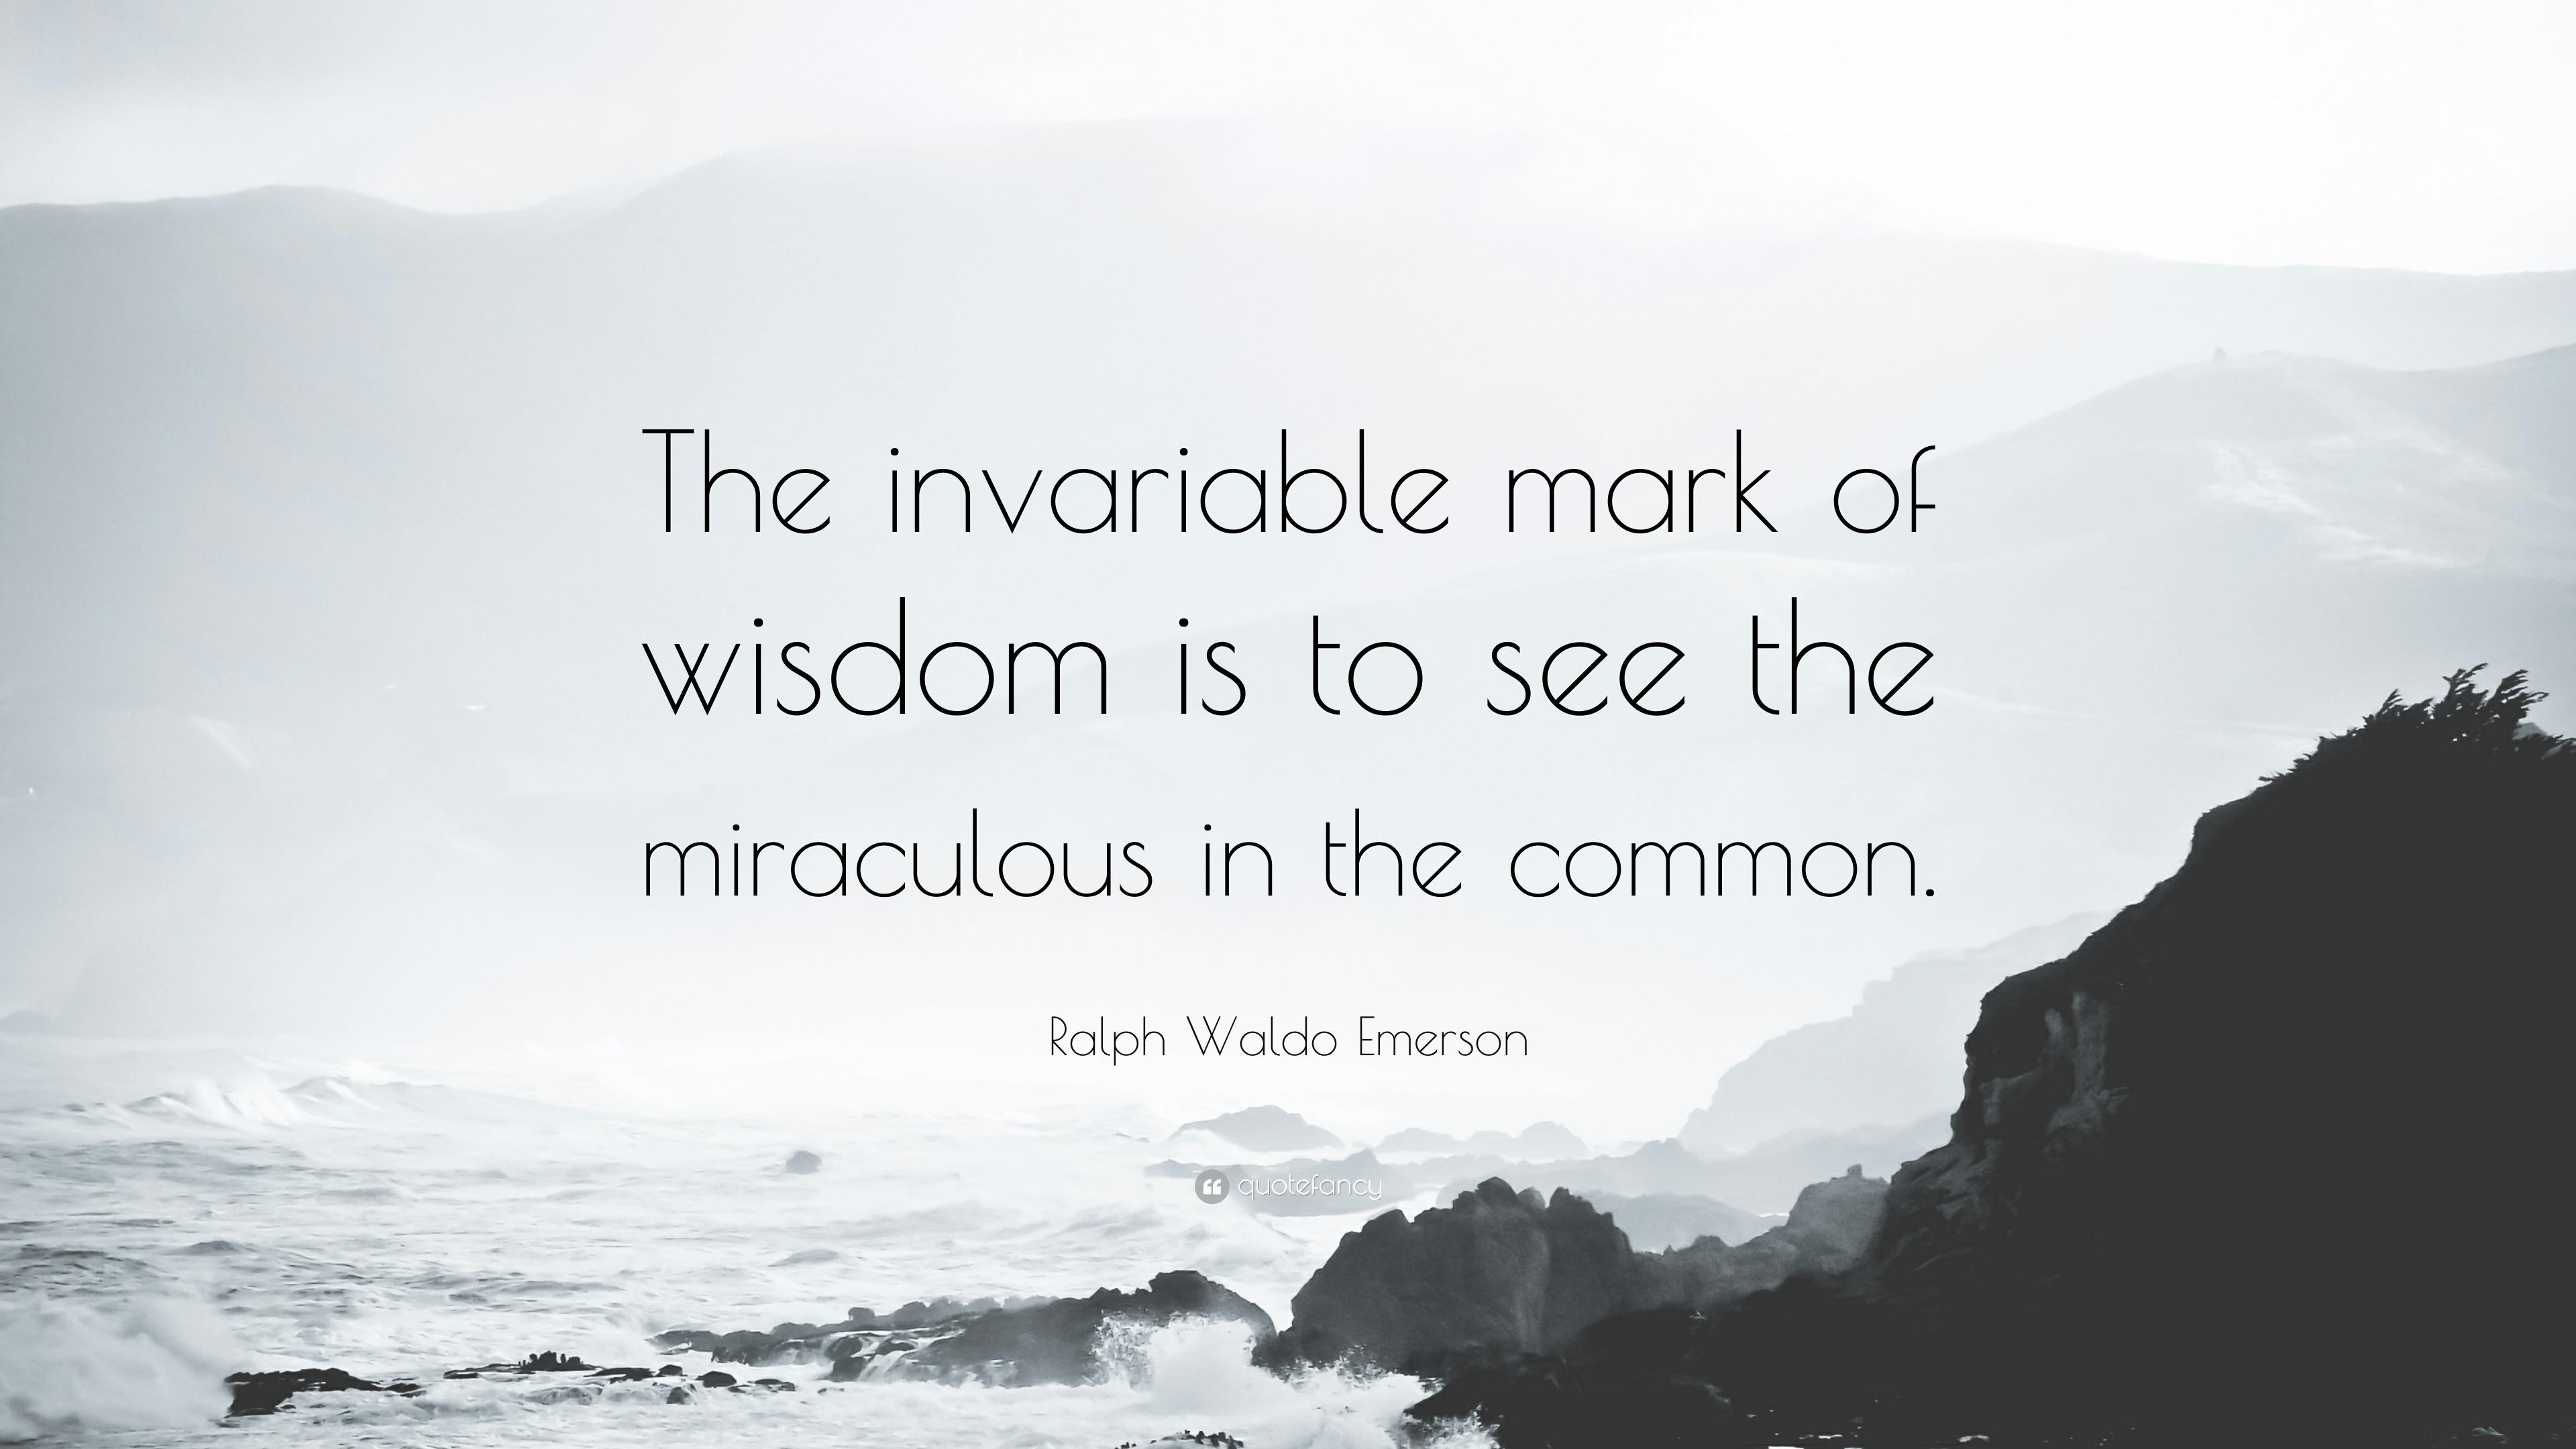 Wisdom Quotes (40 wallpapers) - Quotefancy